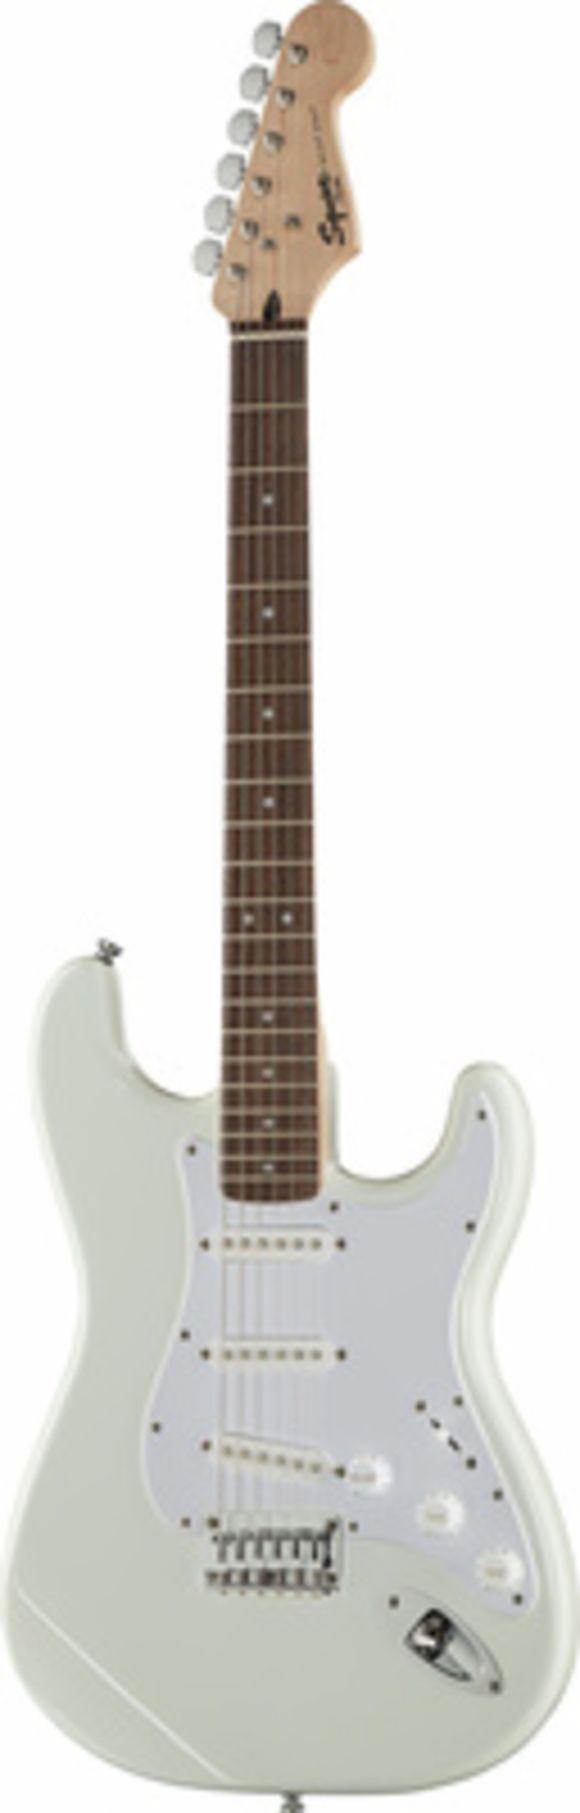 Squier Bullet Strat HT IL AW Fender